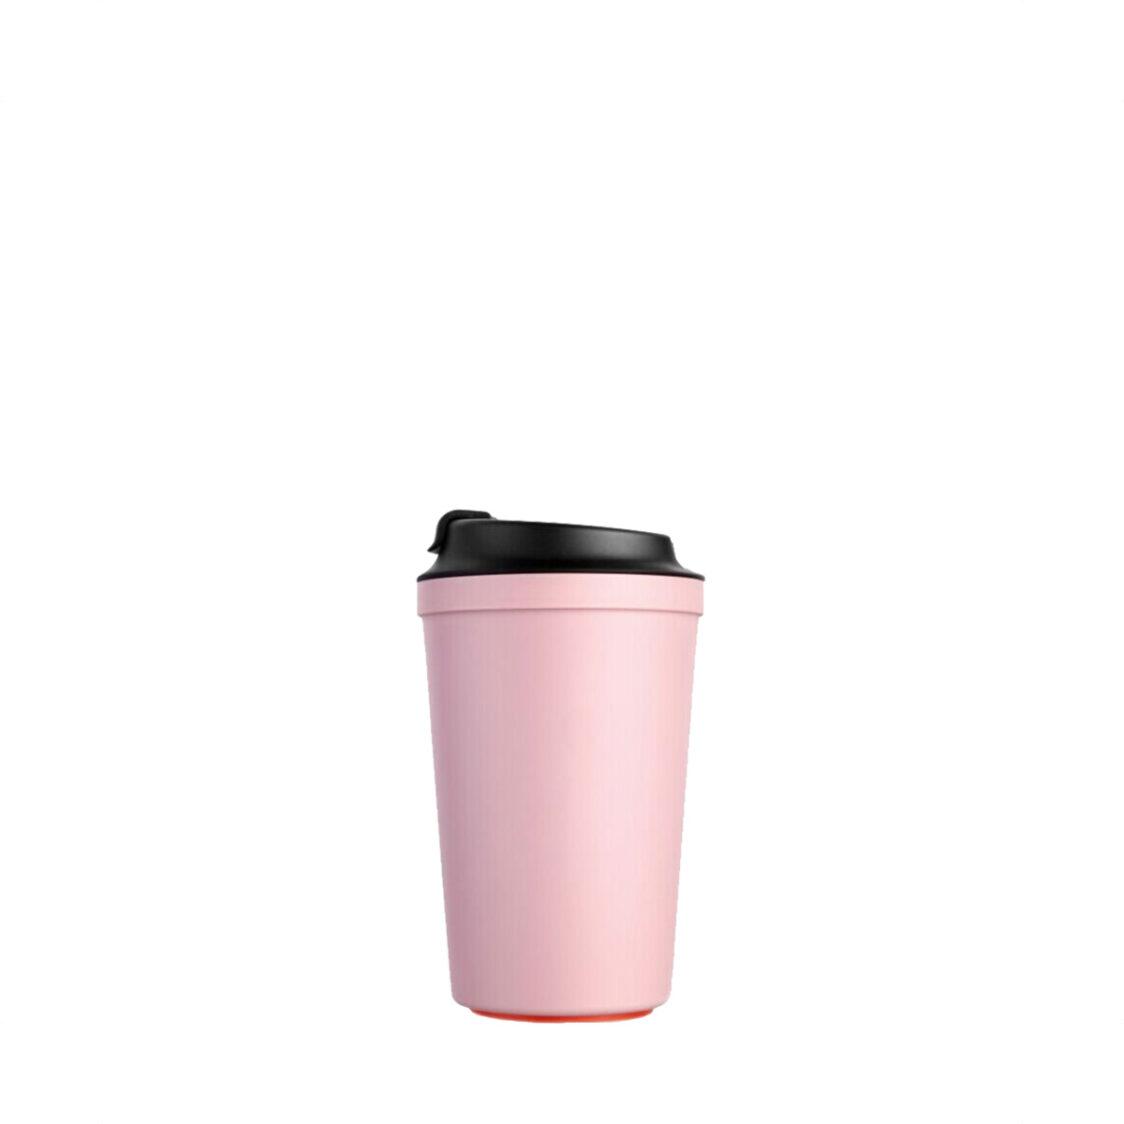 Artiart Suction Idea Caf Mug Pink 340ml